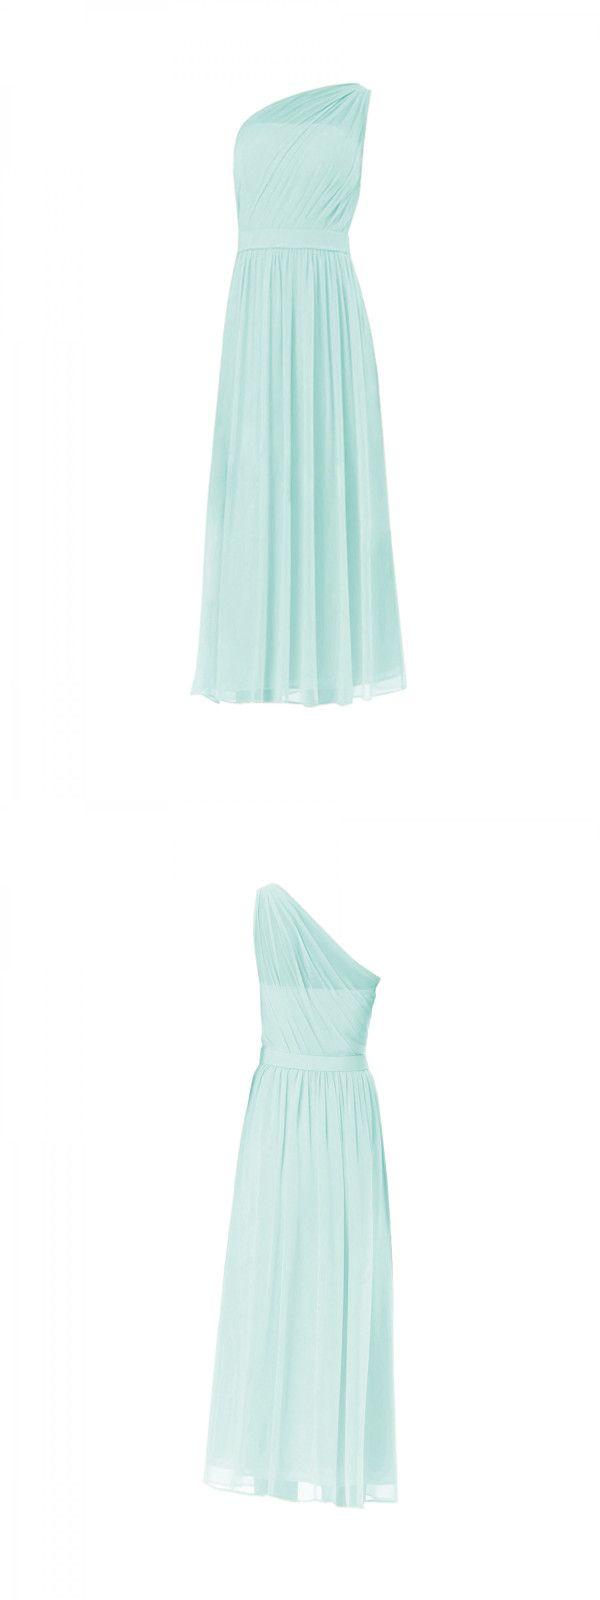 Aline one shoulder floorlength sleeveless chiffon bridesmaid